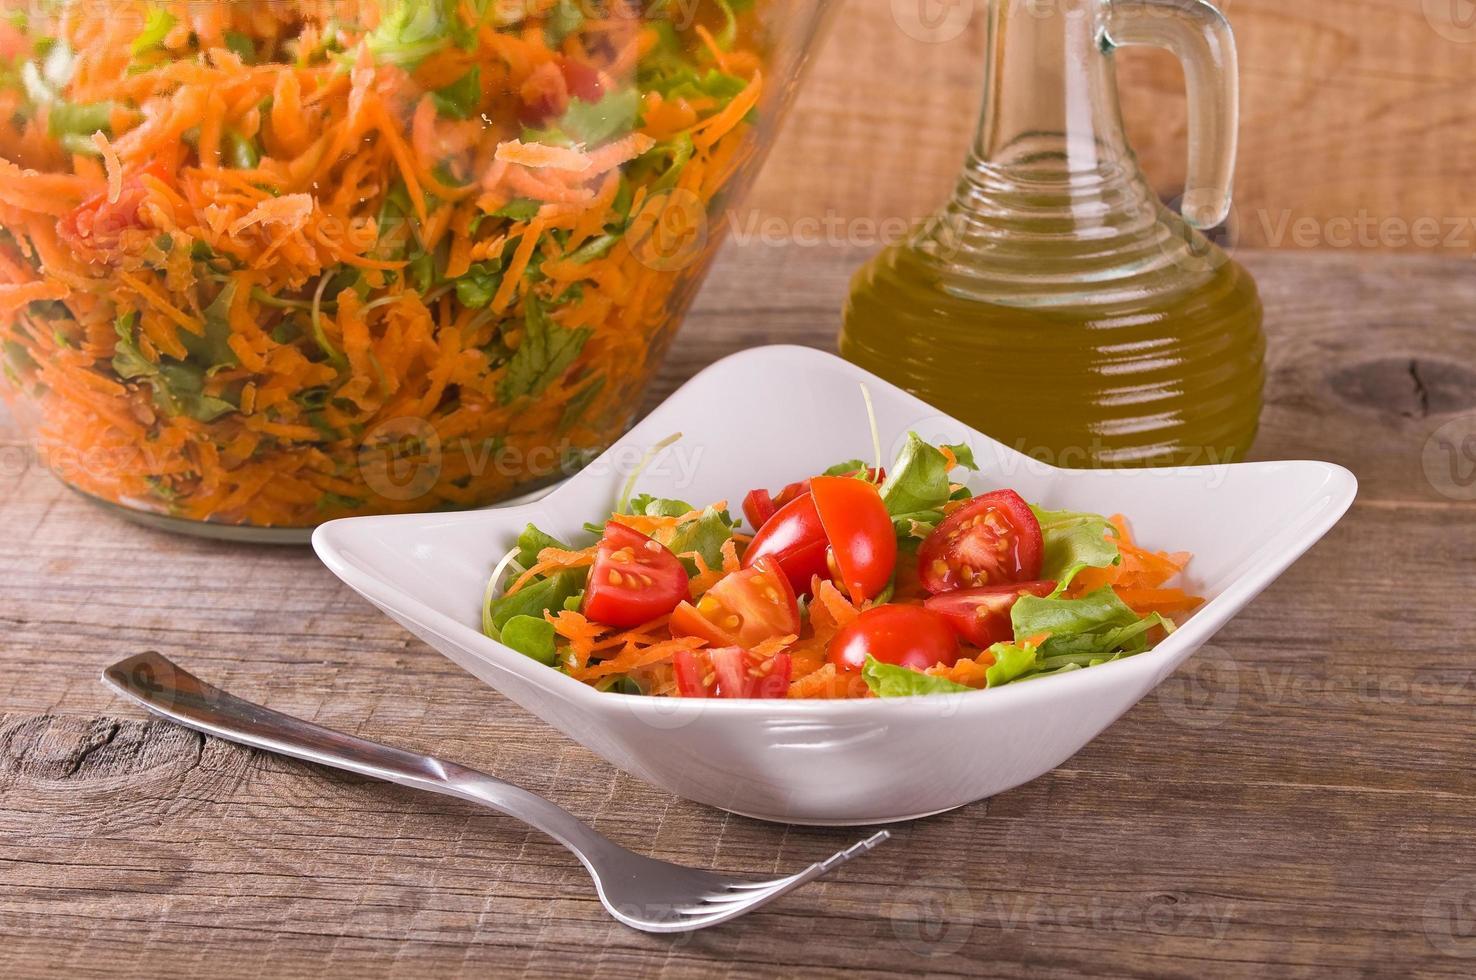 salade de légumes. photo